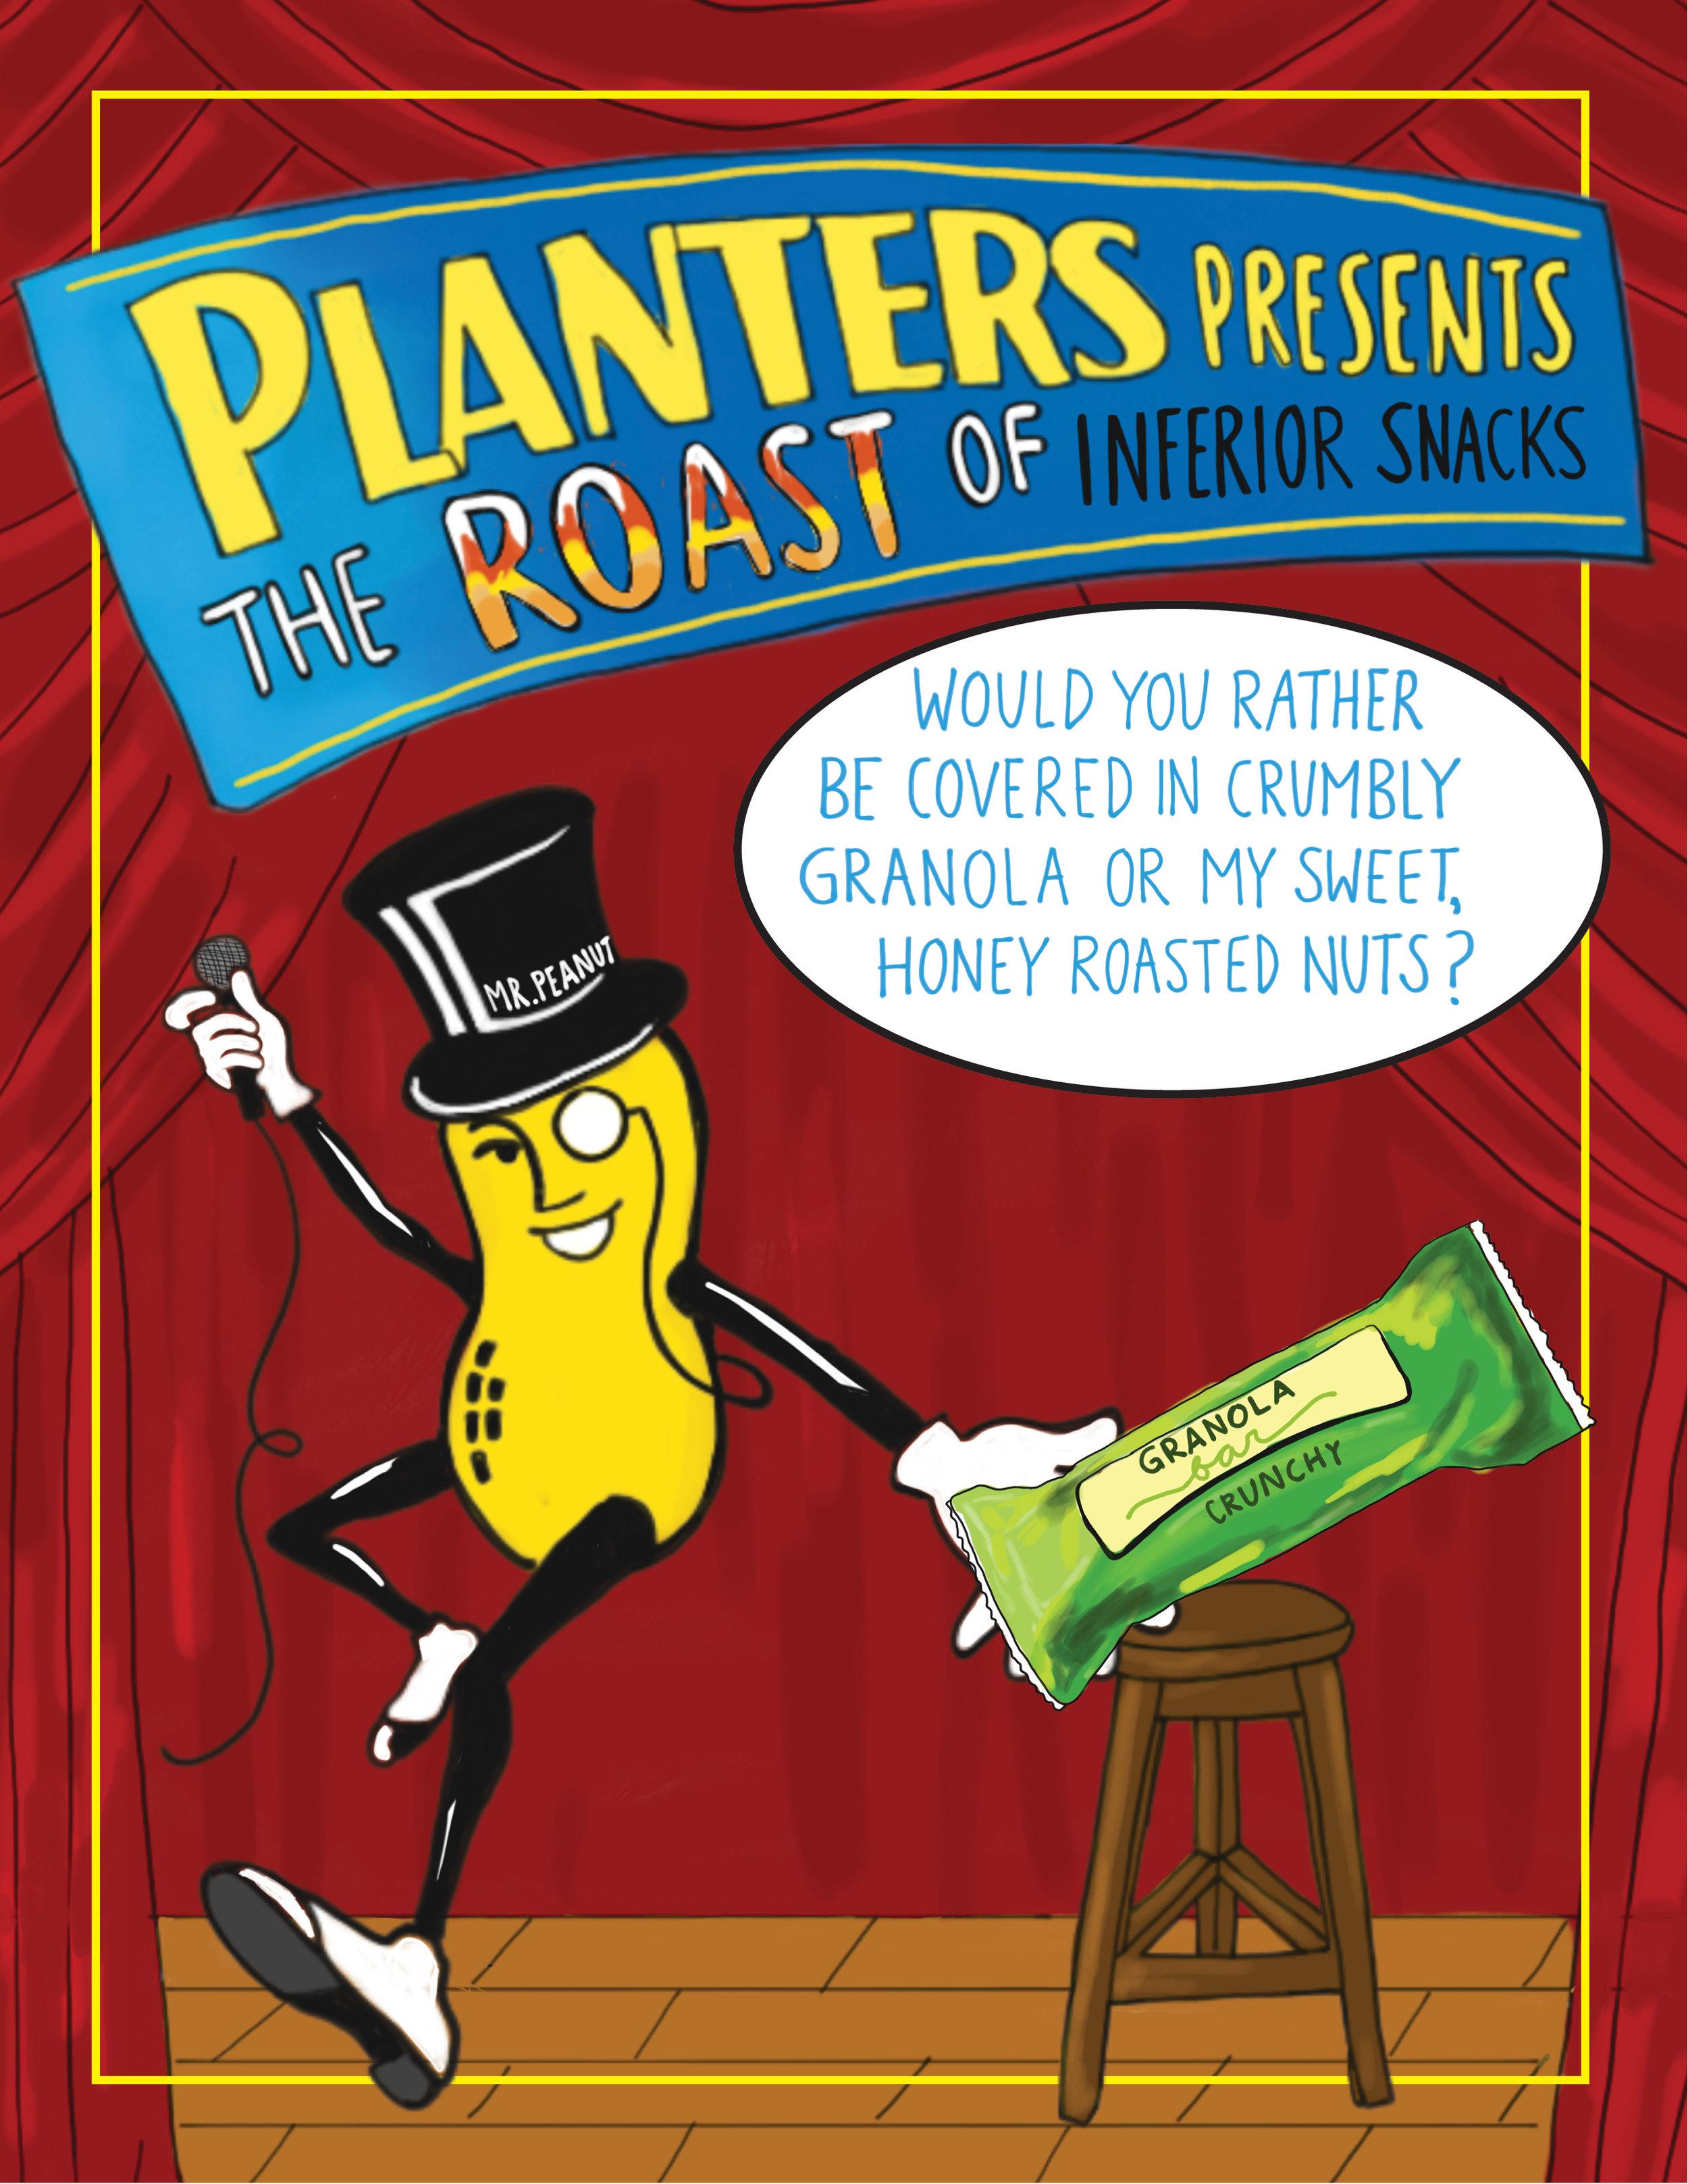 PlantersPeanuts4 copy.jpg